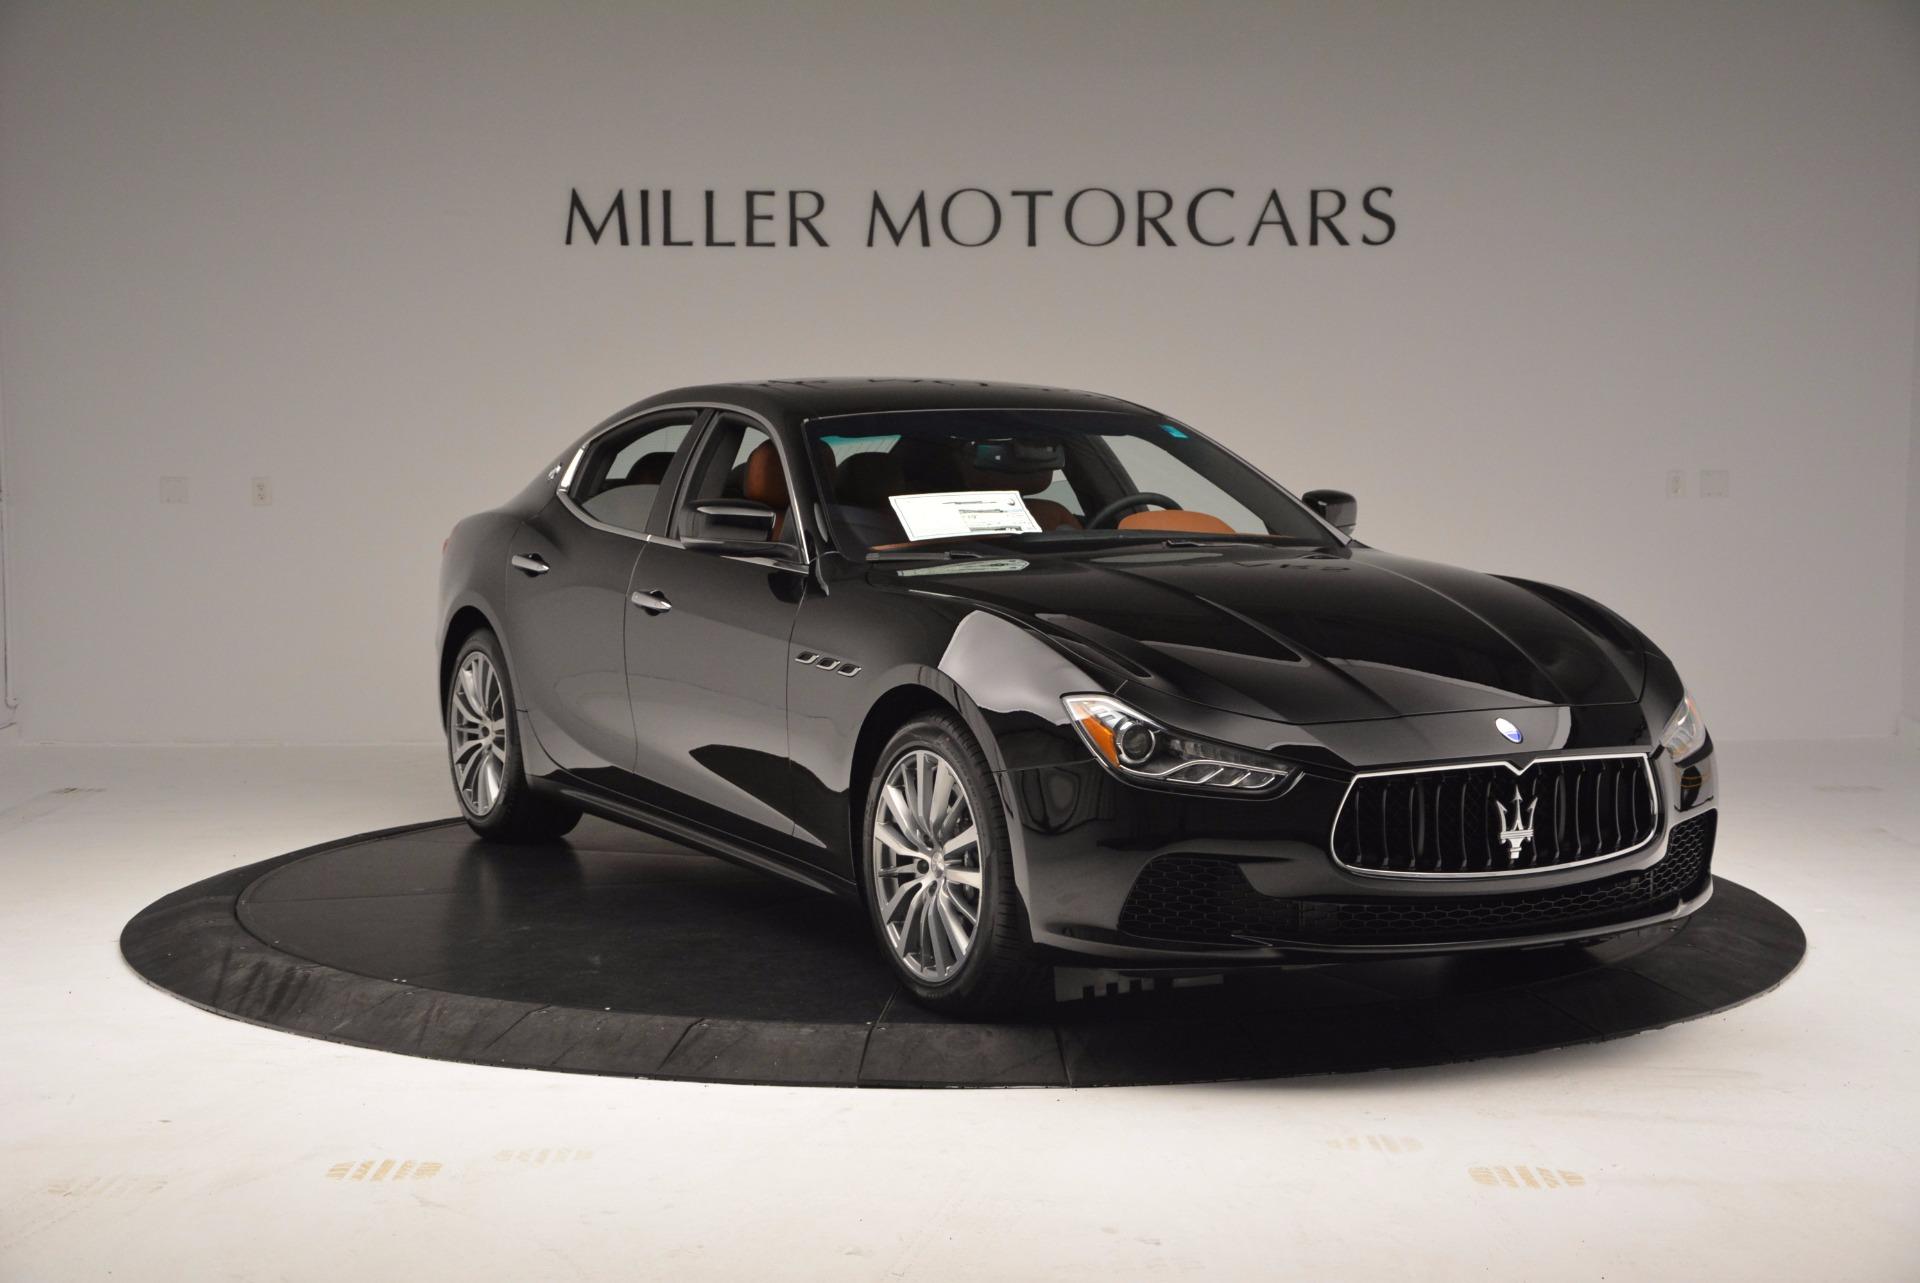 New 2017 Maserati Ghibli S Q4 EX-LOANER For Sale In Greenwich, CT 1115_p11